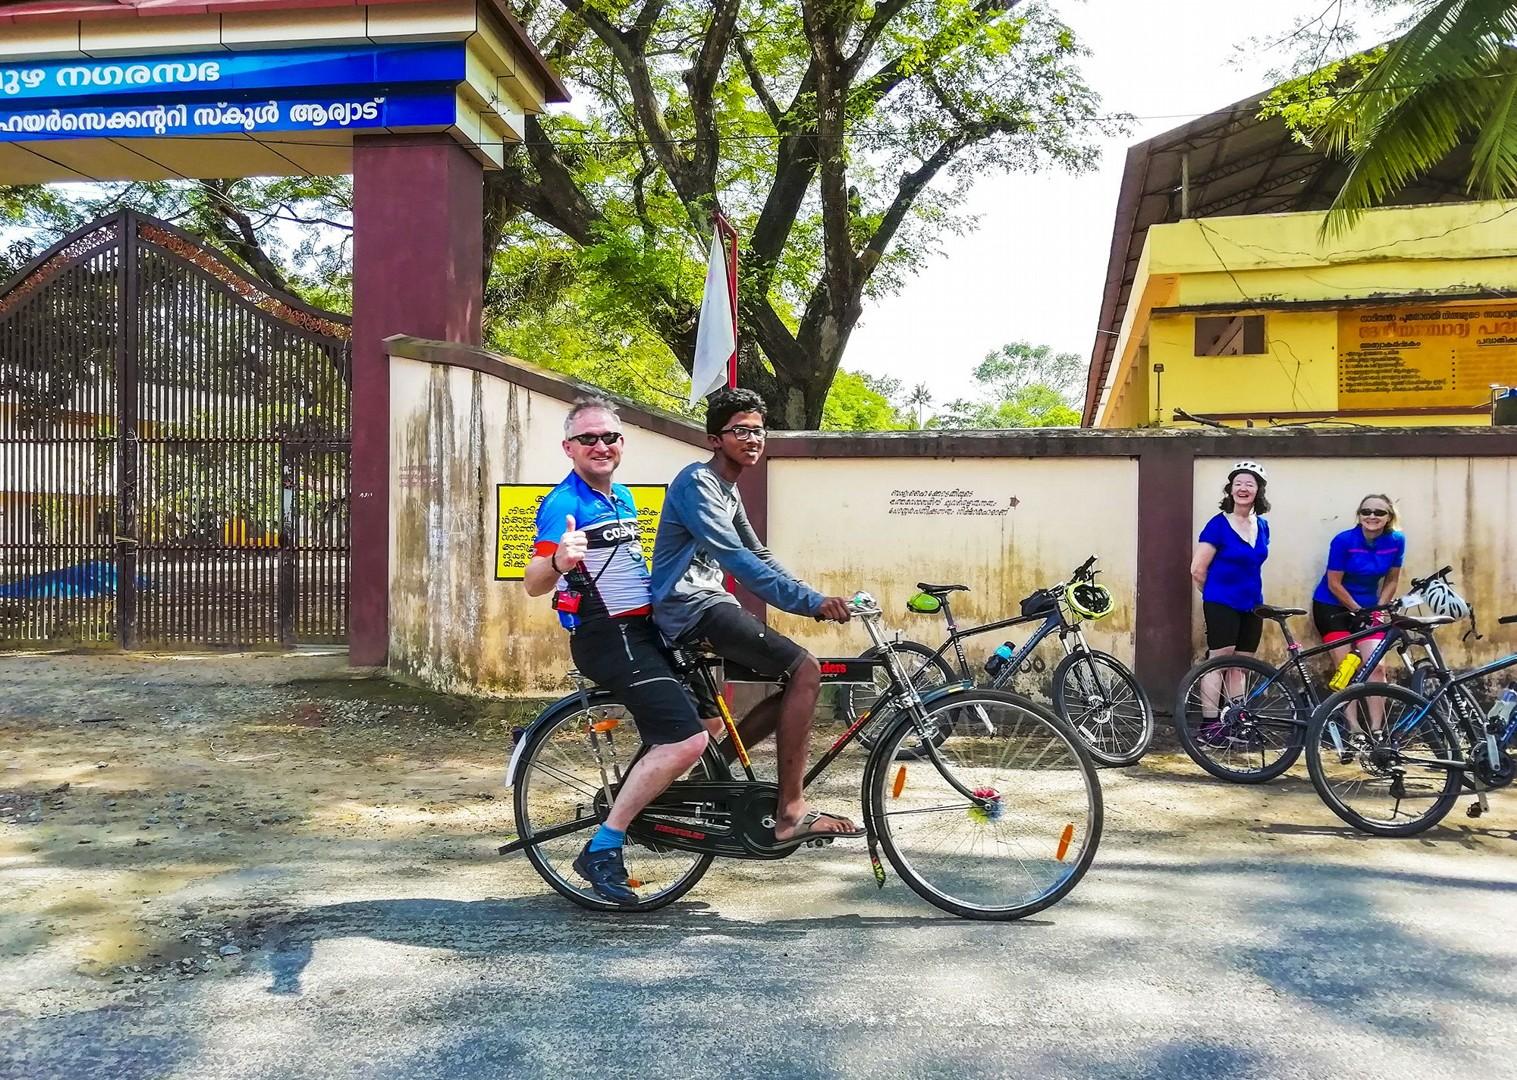 IMG_20181120_110730-2.jpg - India - Classic Kerala - Cycling Adventures